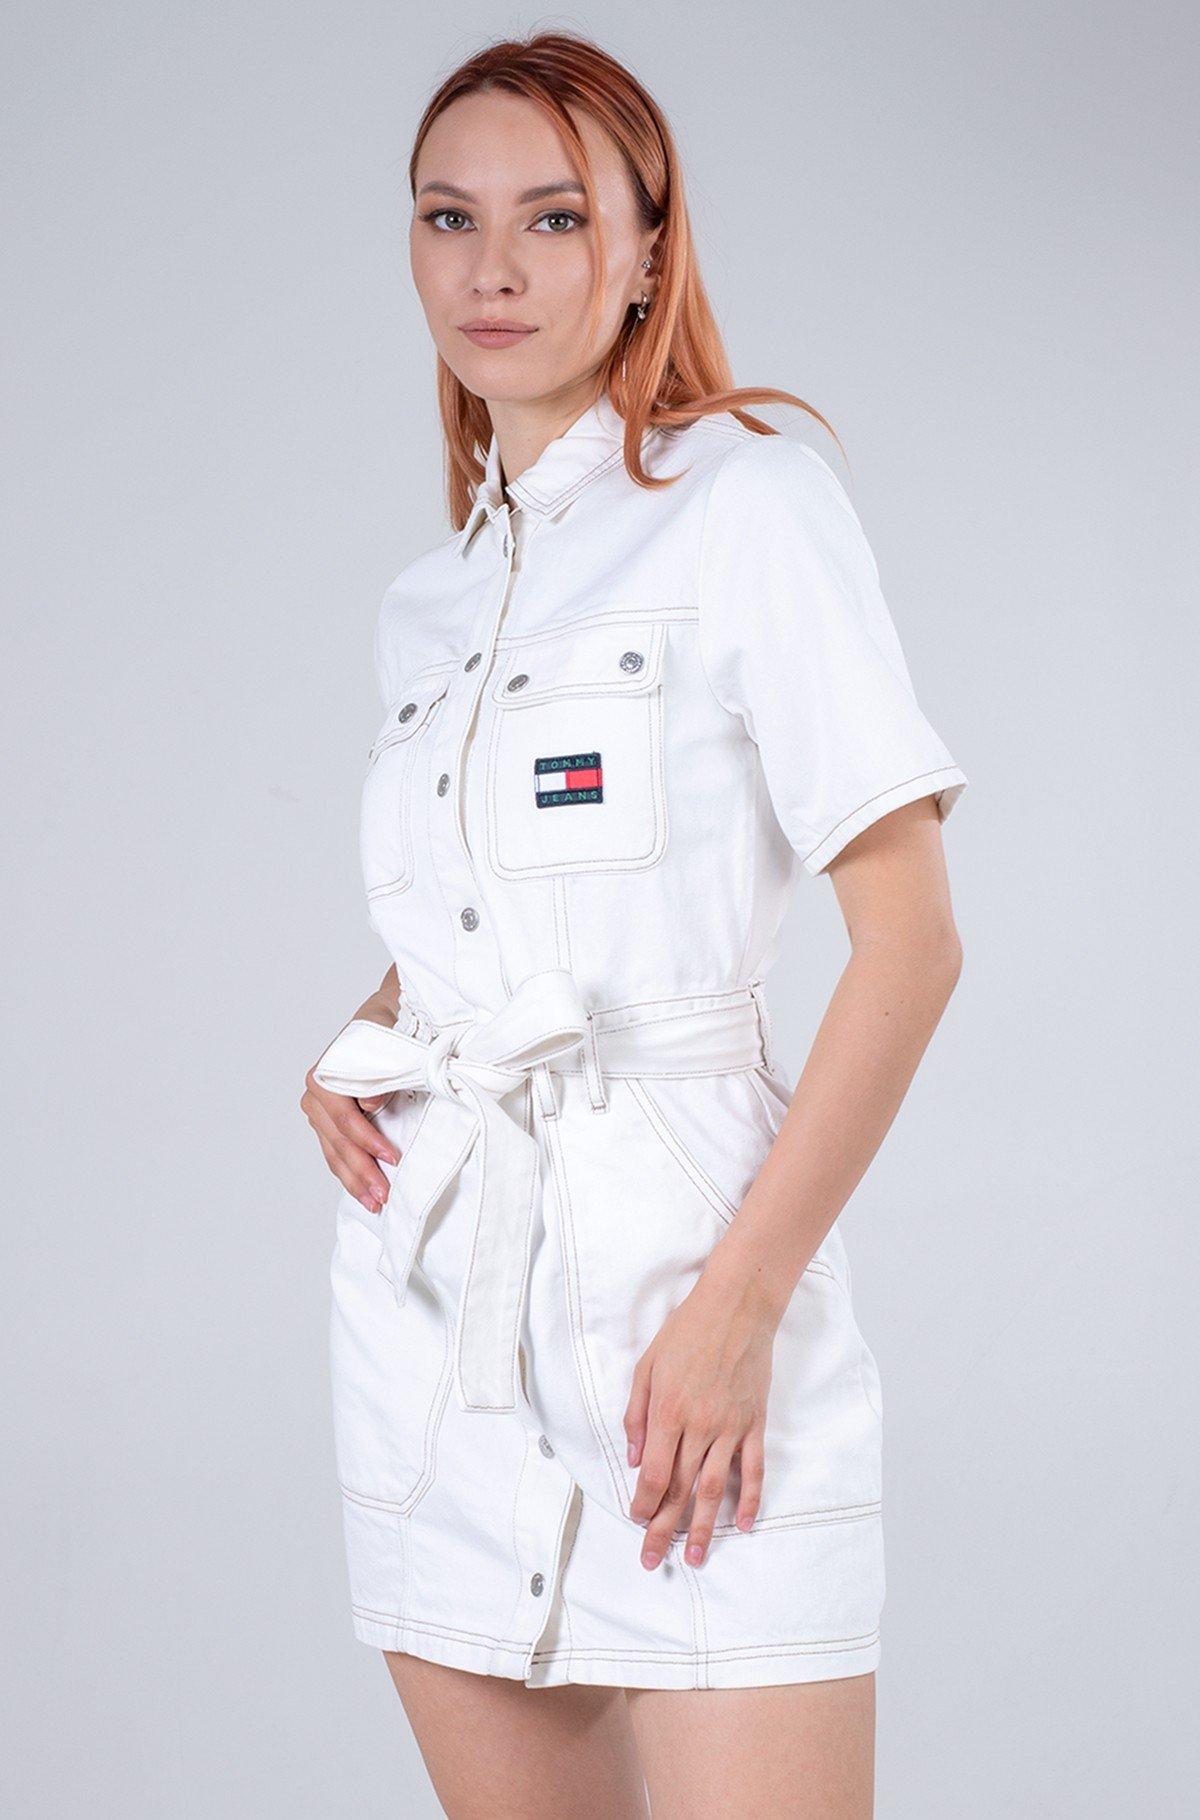 Teksakleit UTILITY TWILL DRESS AE795 SWR-full-1